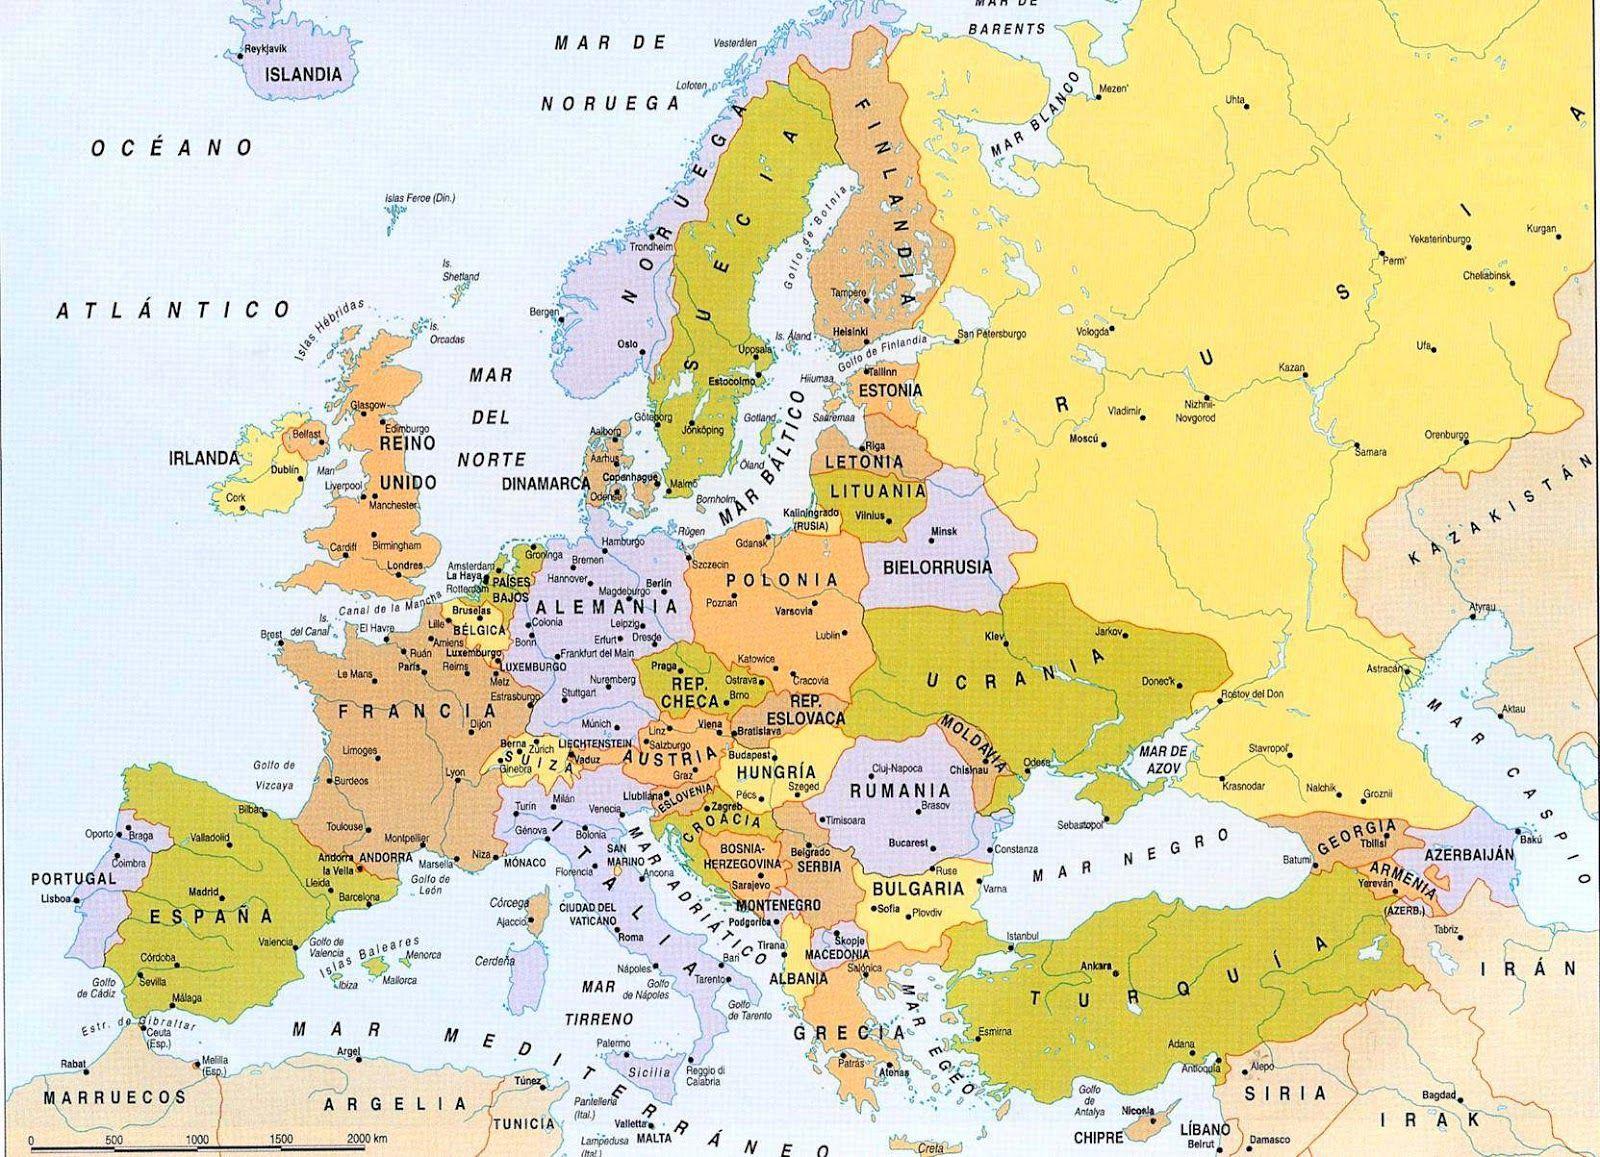 MAPA Politico Grande De America Europa Asi Africa Oceania Online - America mapa juego